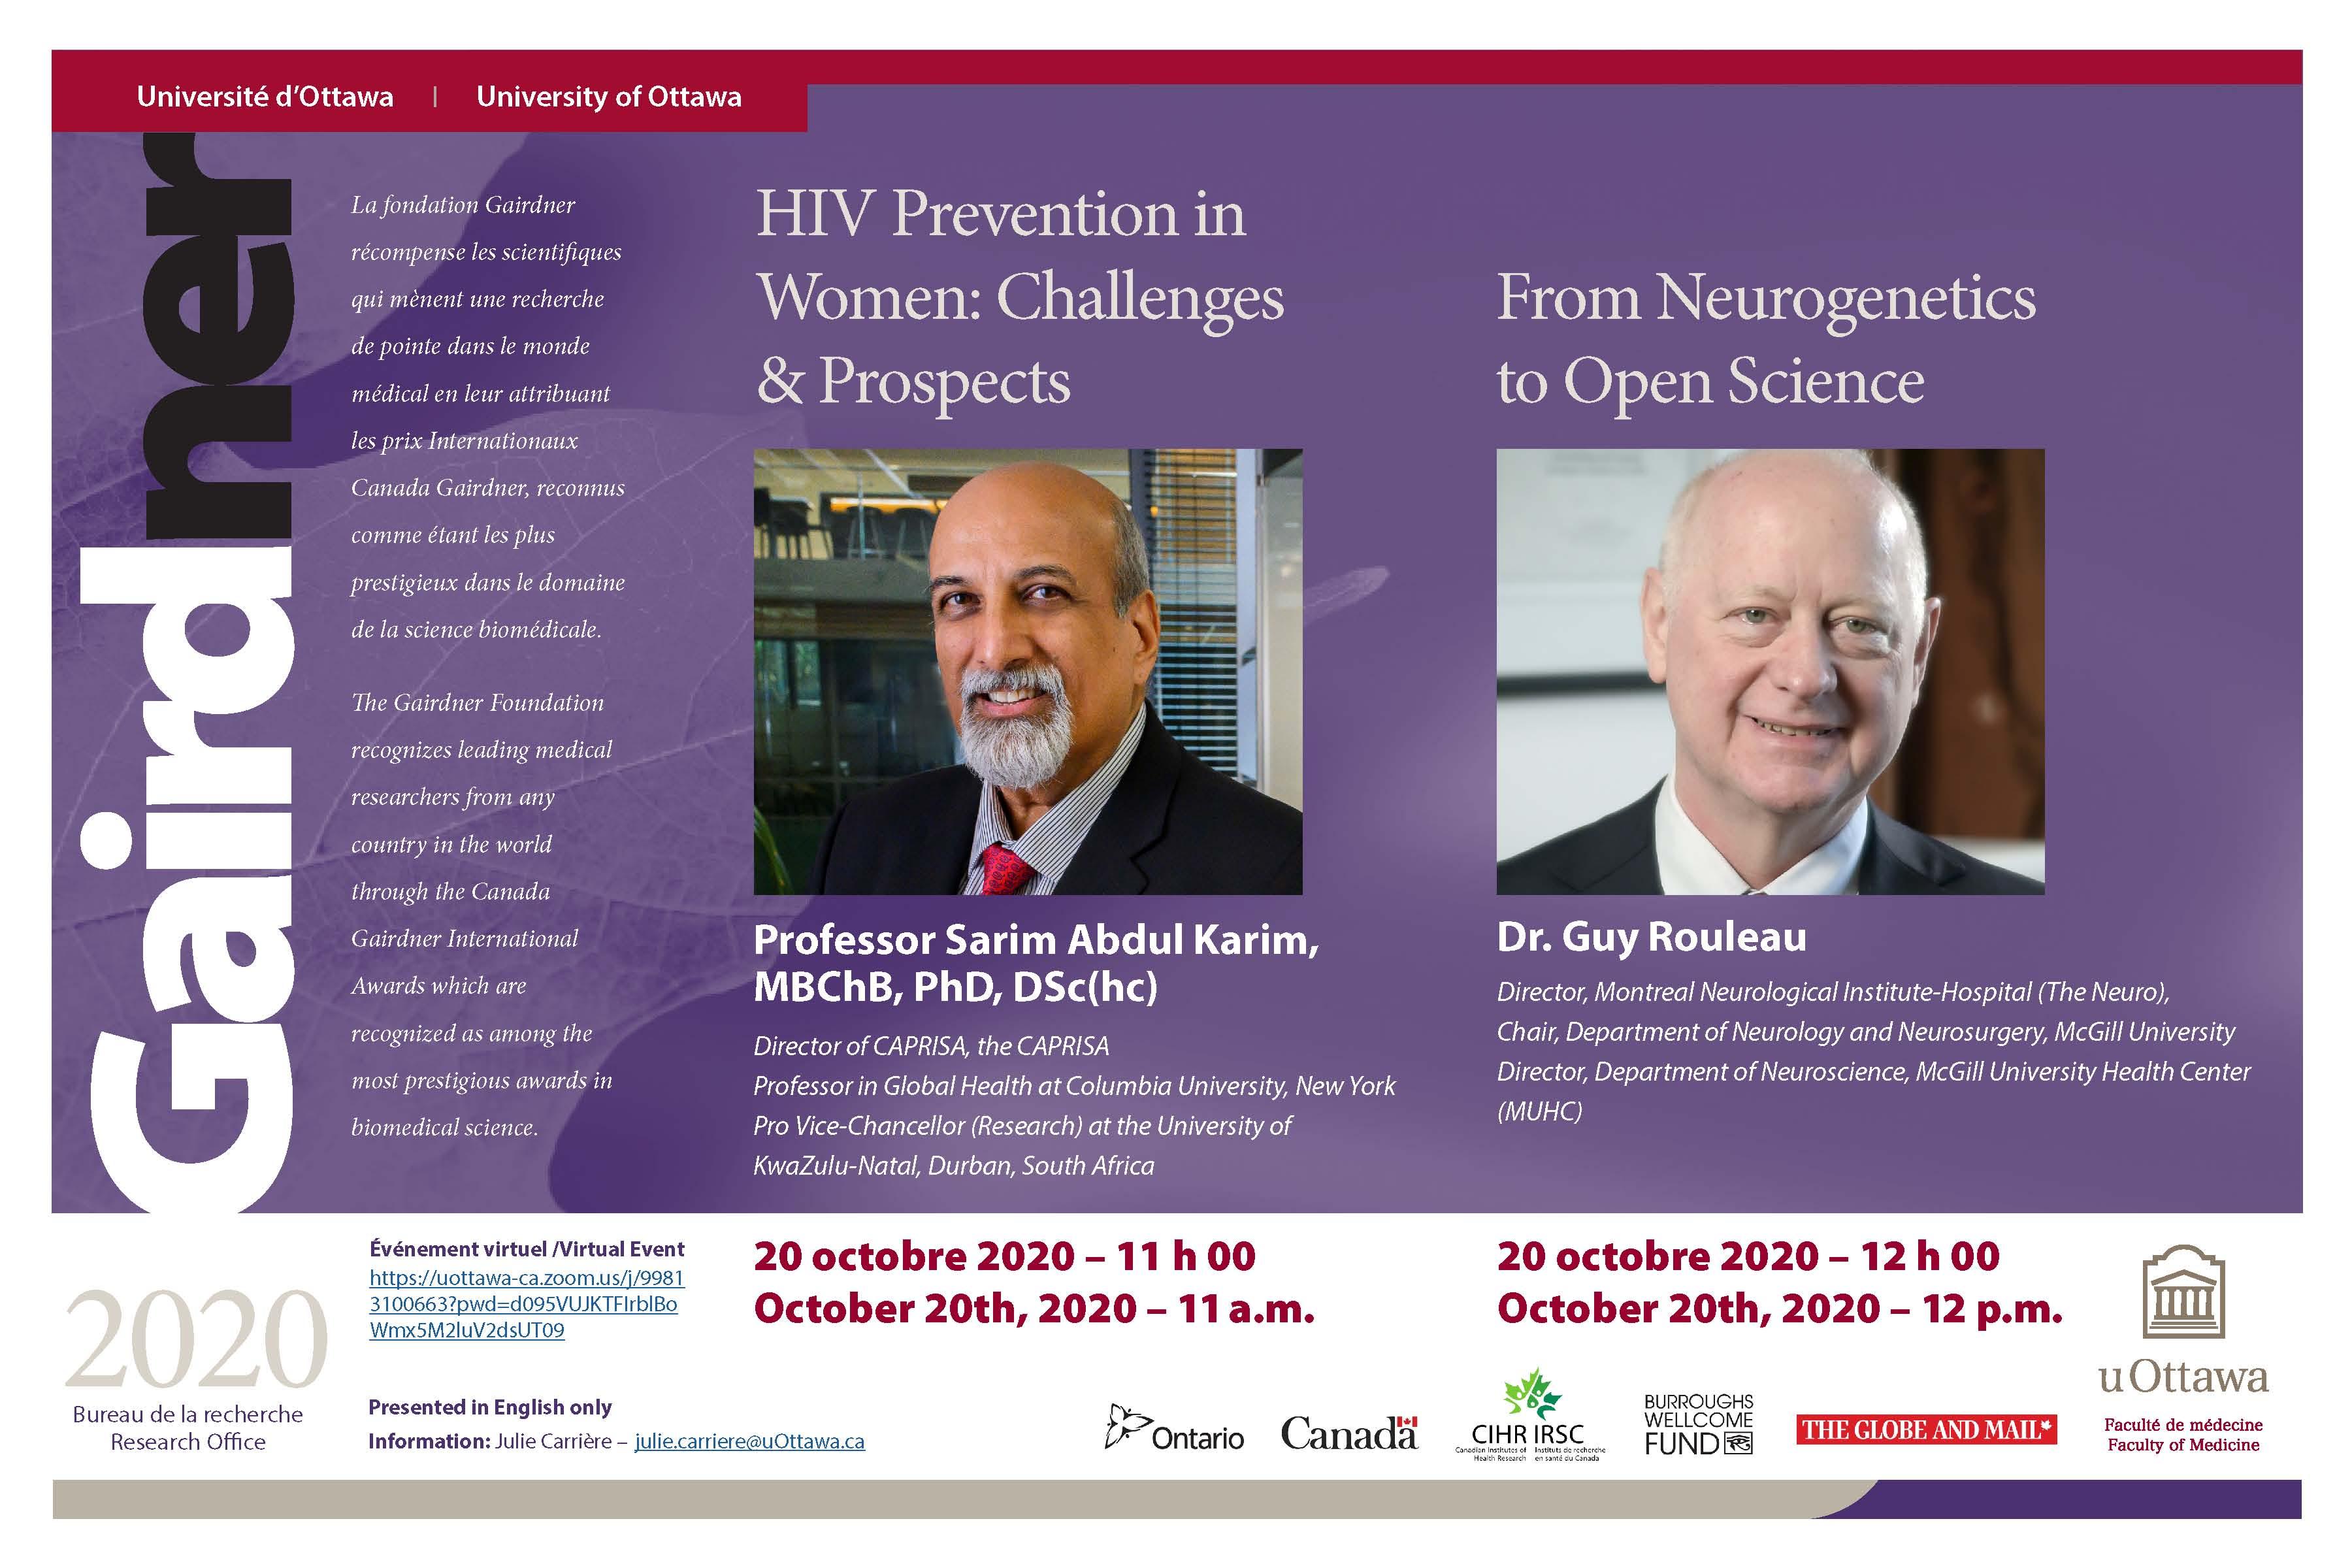 conférence gairdner 2020 le mardi 20 octobre